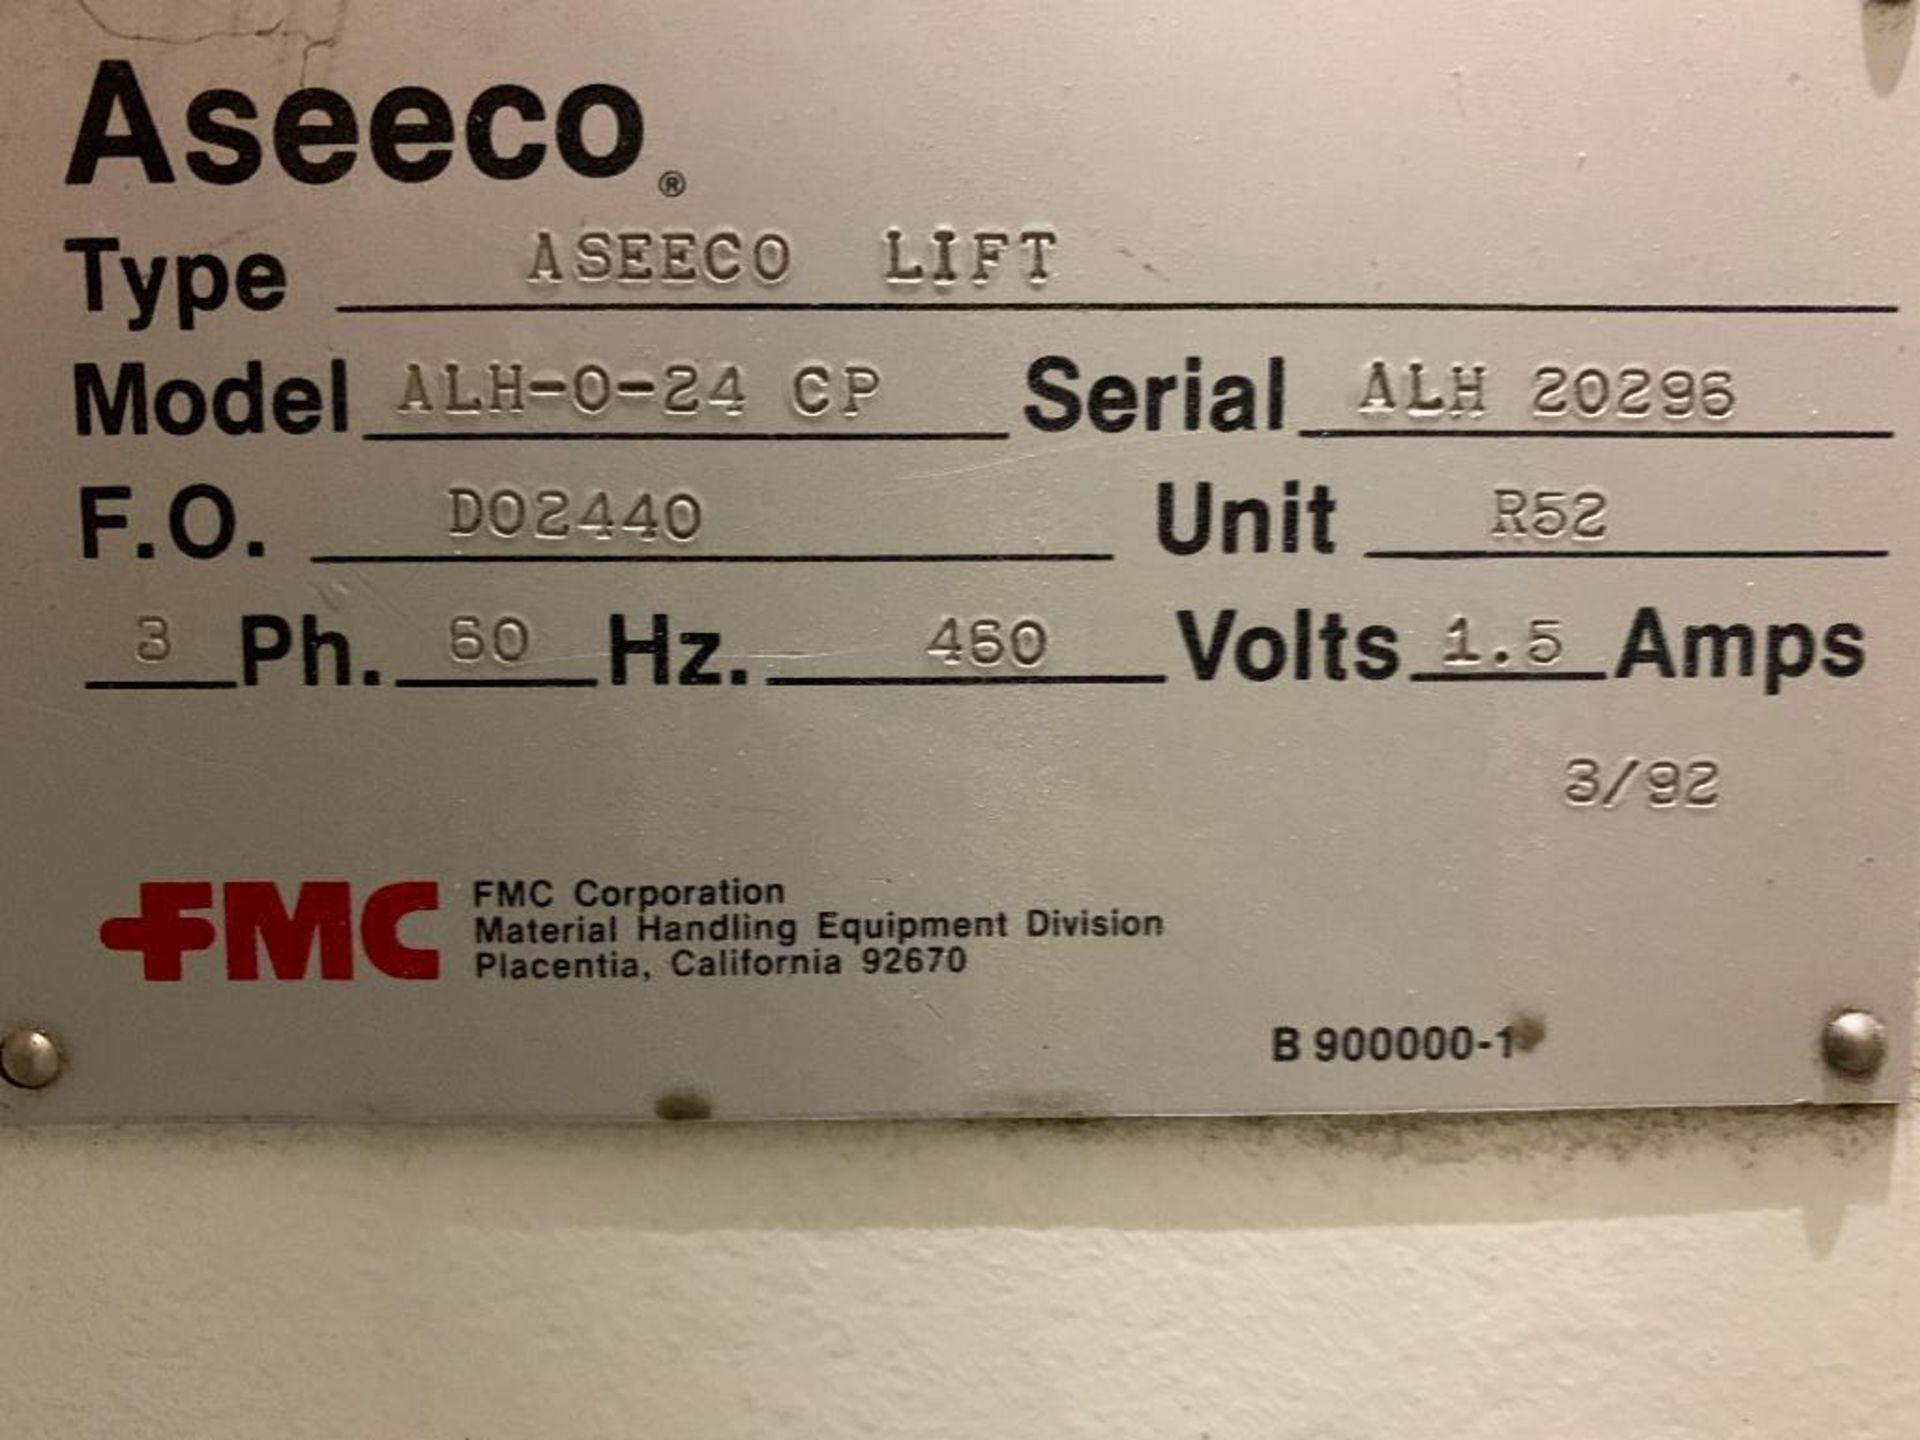 1990 Aseeco horizontal bucket elevator, model ALH-0-24 - Image 16 of 16